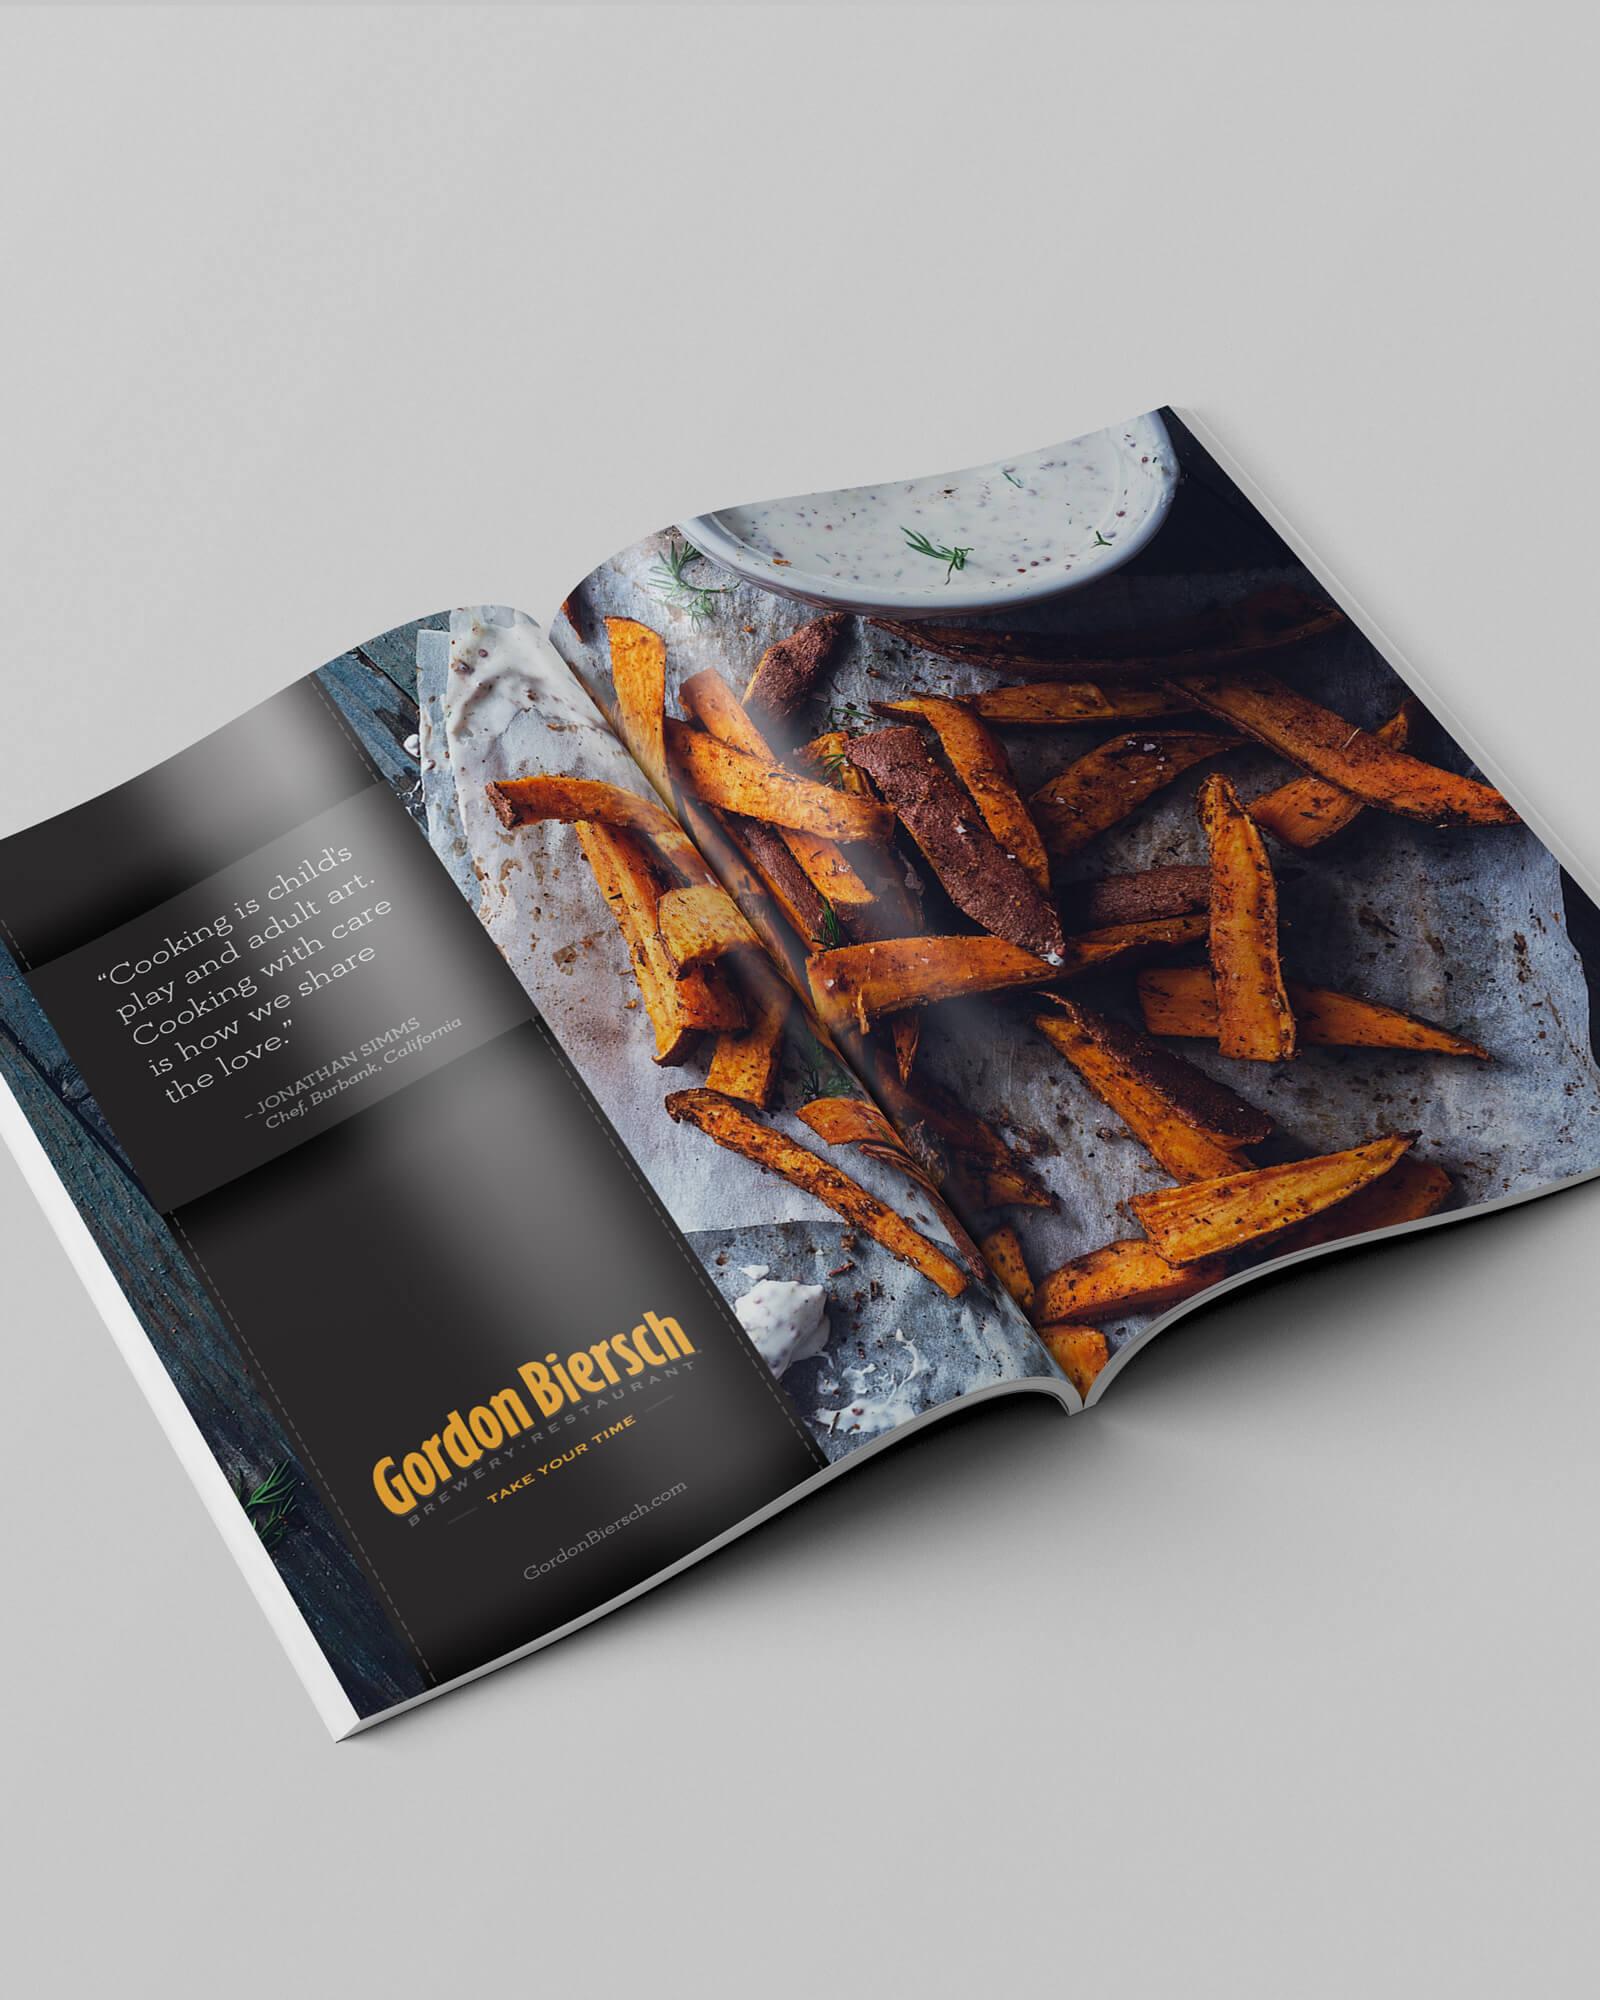 gordon-biersch-fries-print-ad.jpg